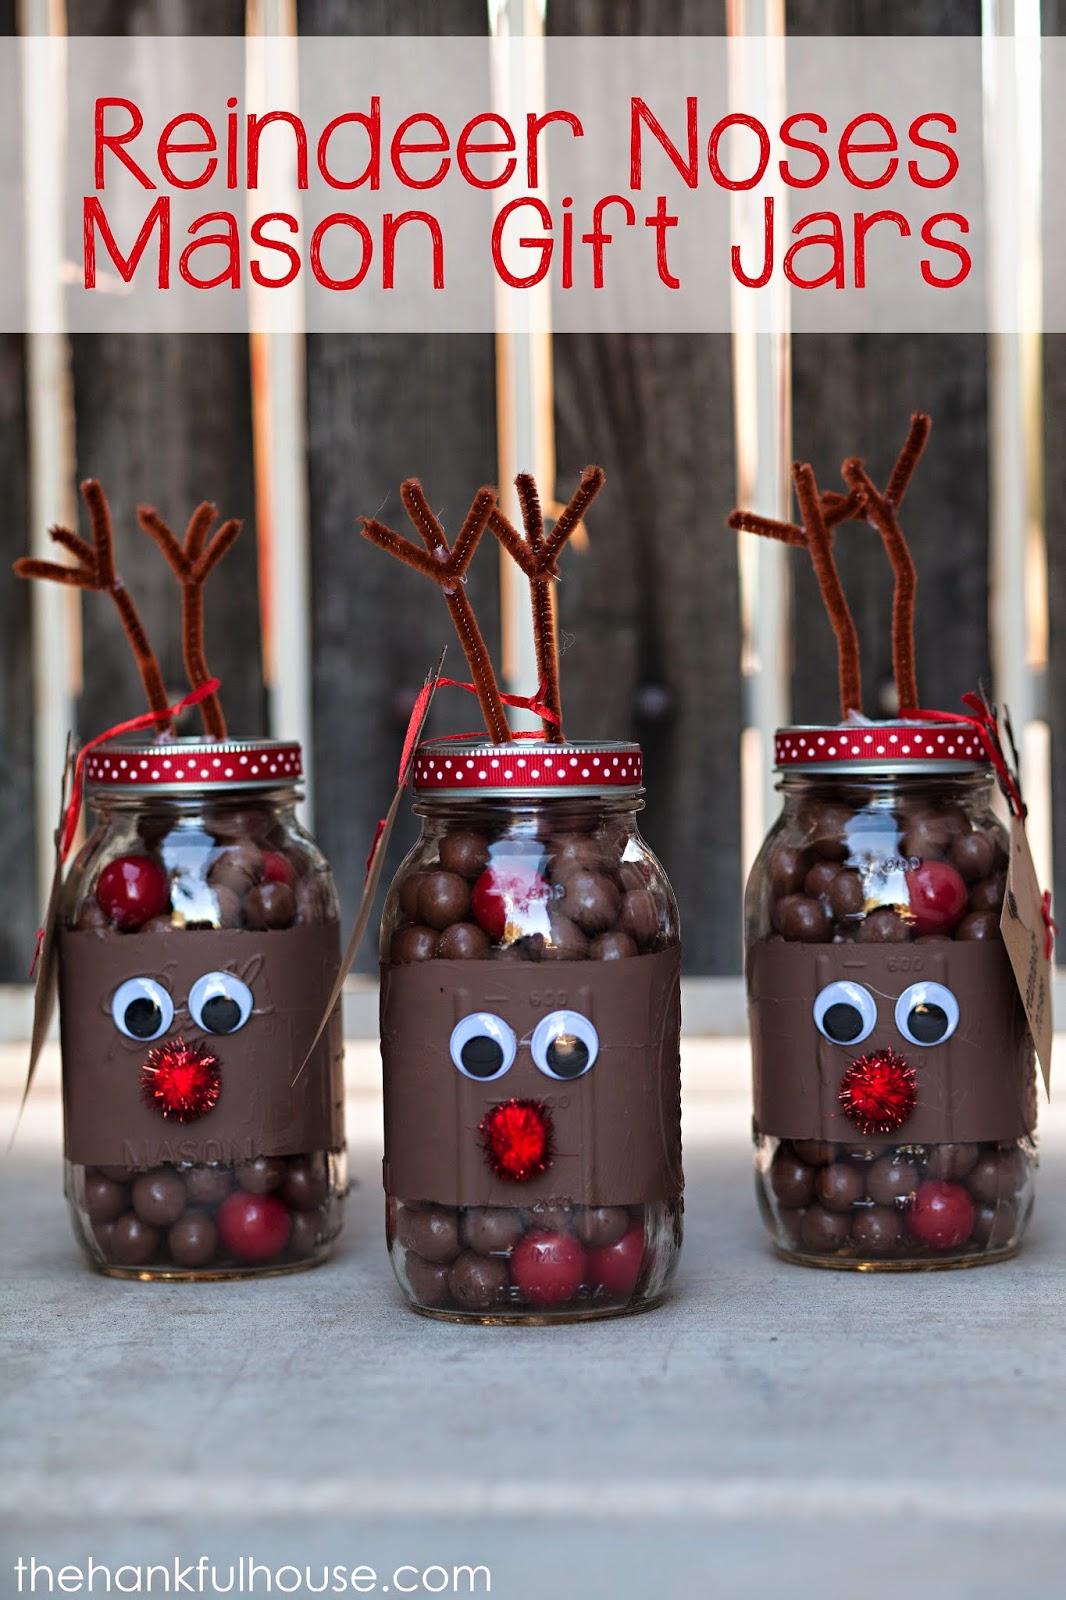 Reindeer Noses Mason Gift Jars